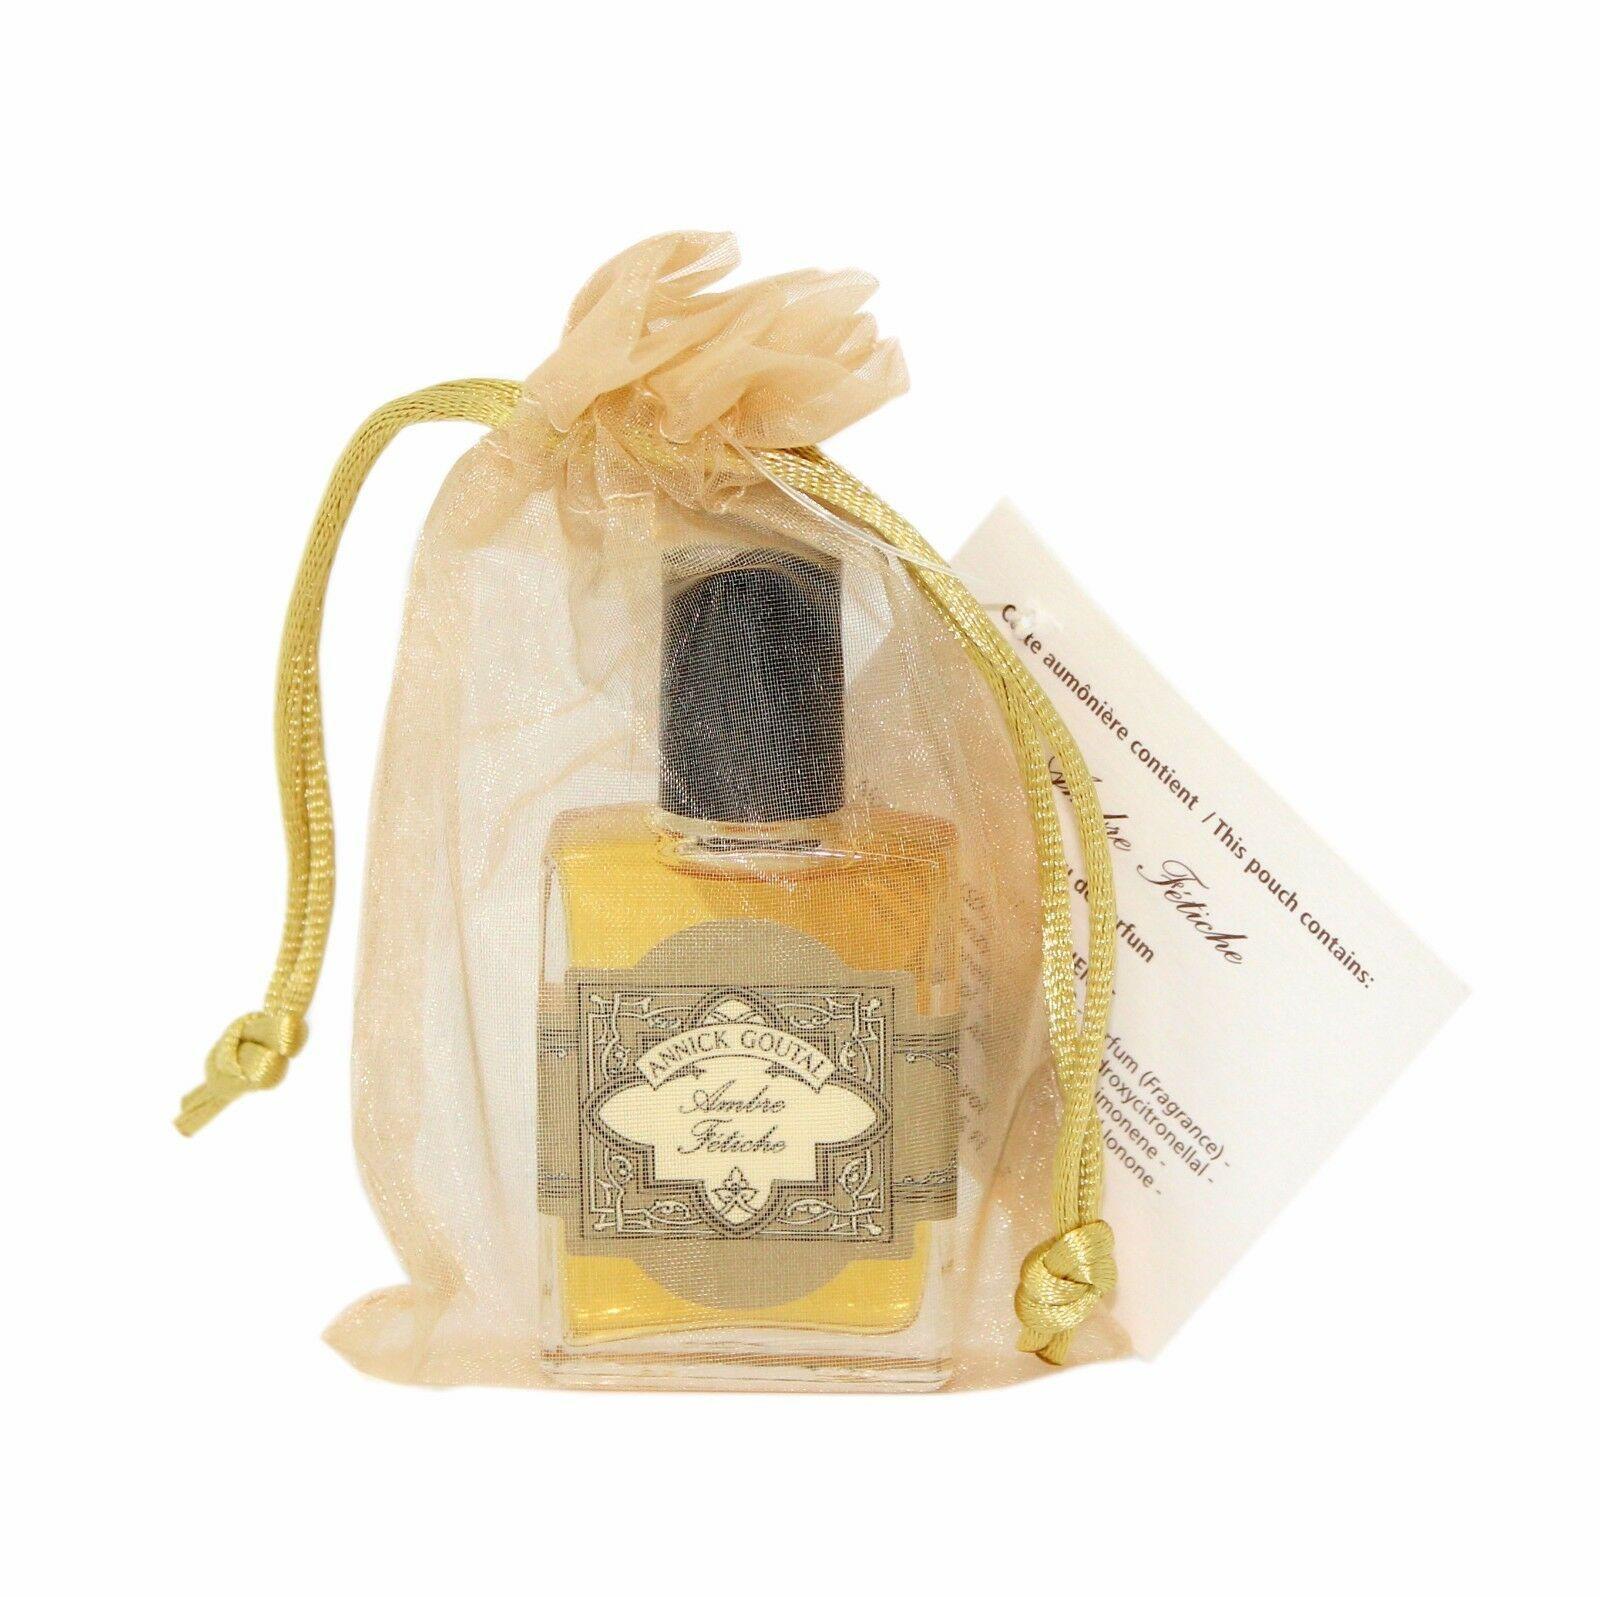 Annick goutal petite cherie refillable perfume